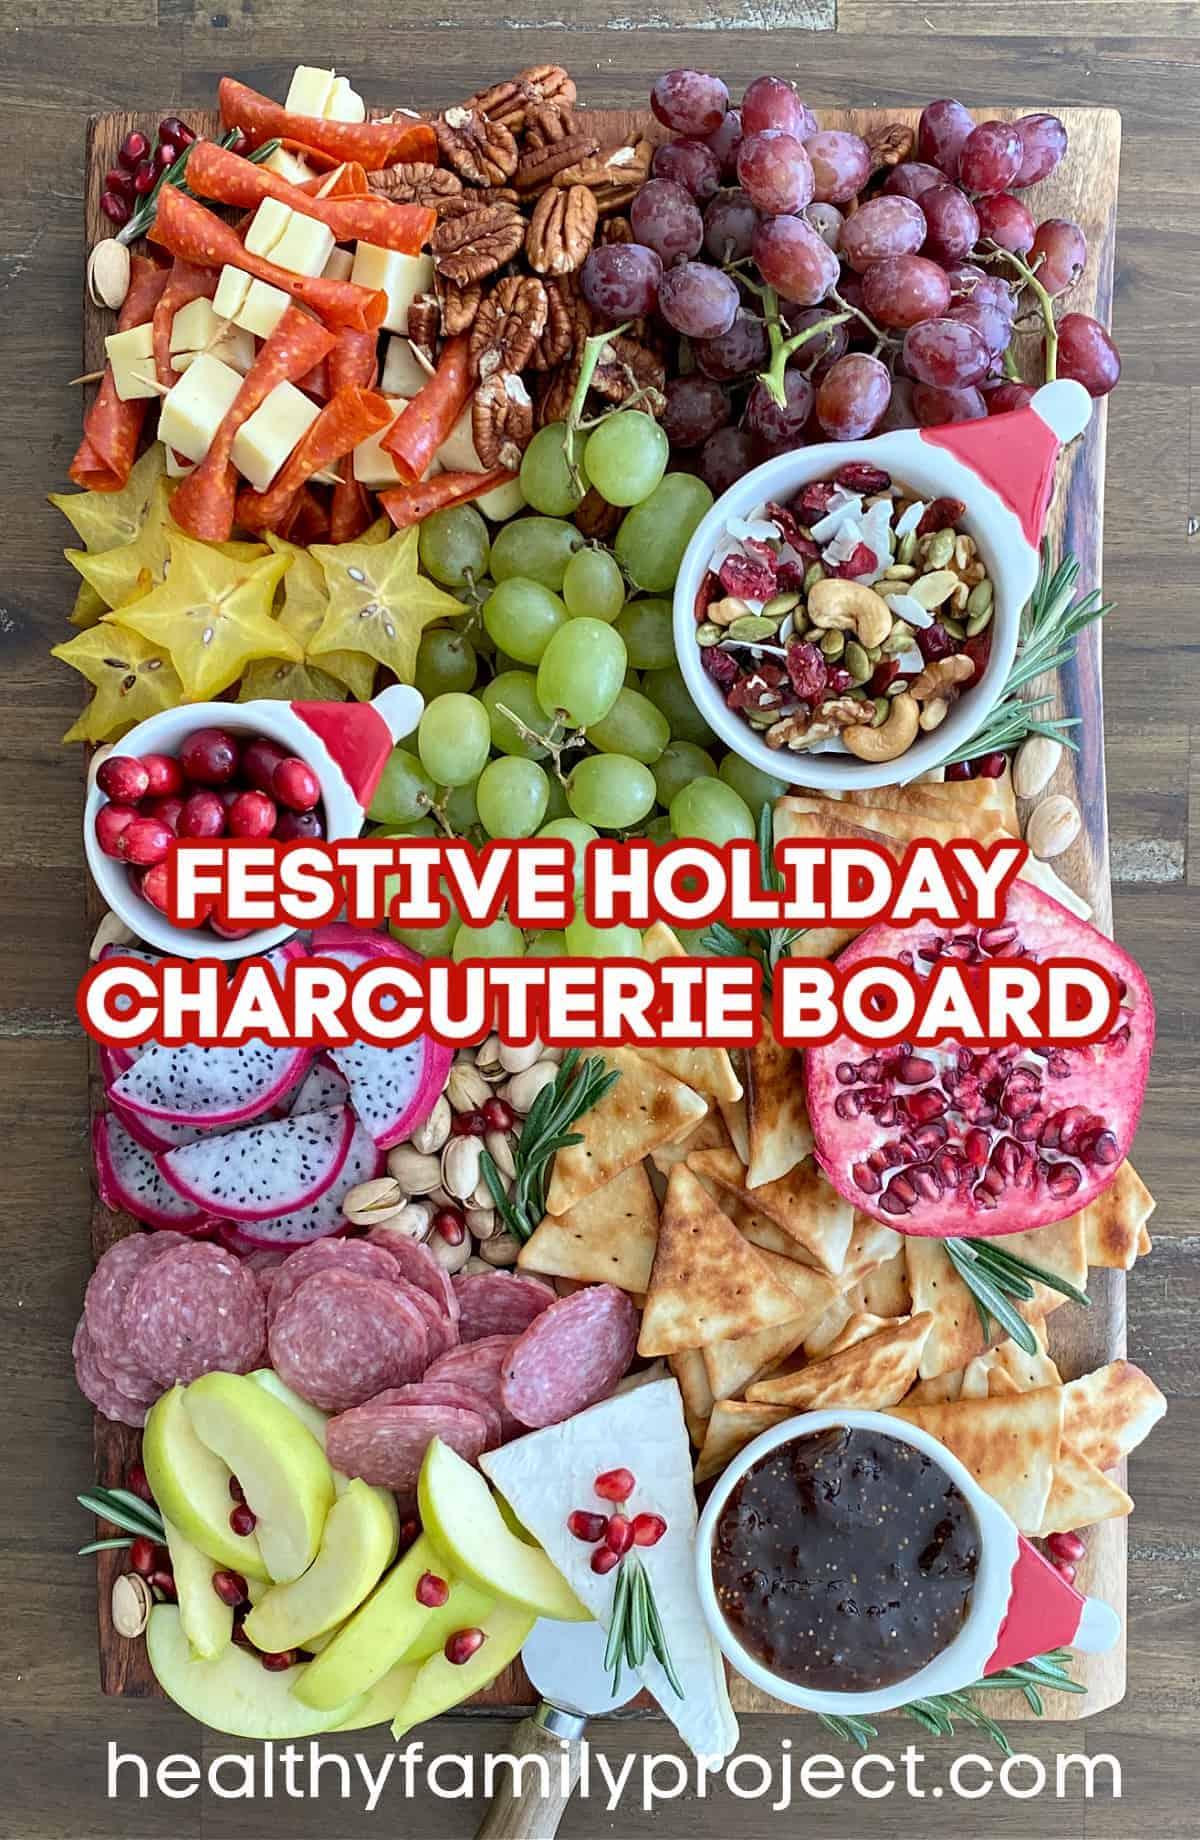 Festive Holiday Charcuterie Board